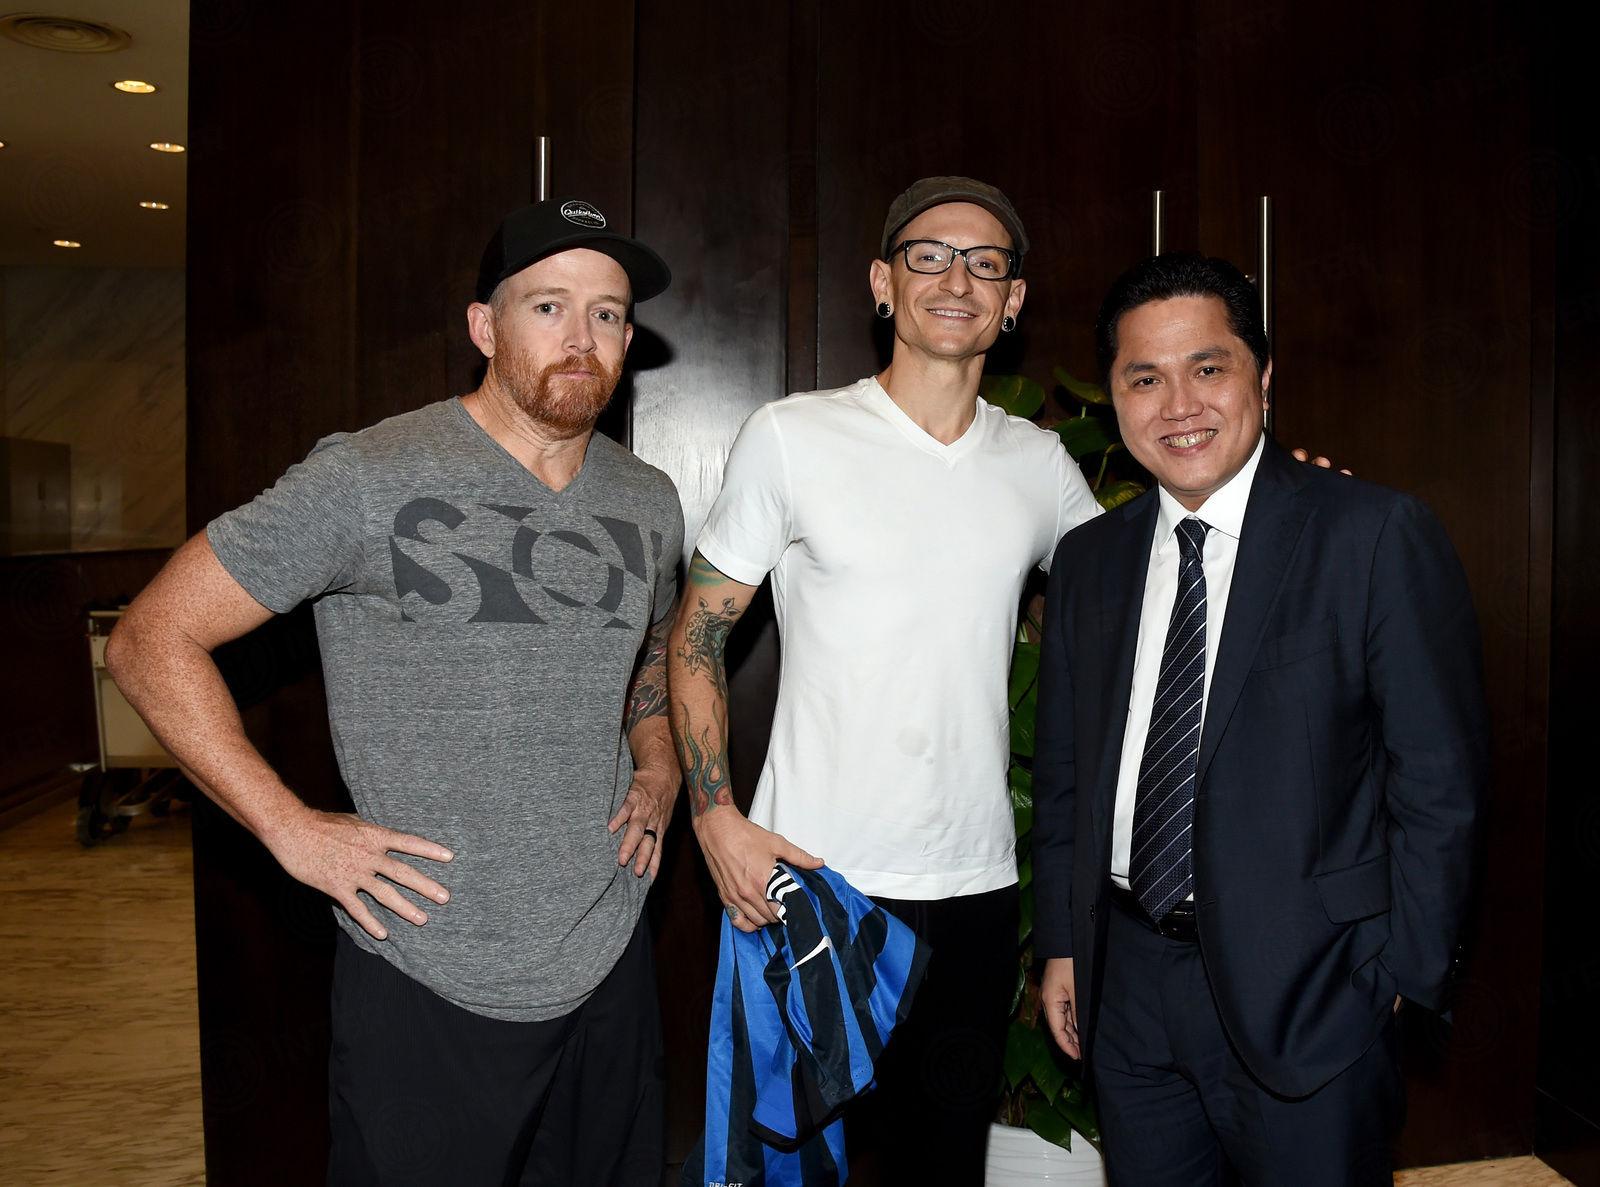 Verso Shenzhen, il saluto dei Linkin Park ai nerazzurri